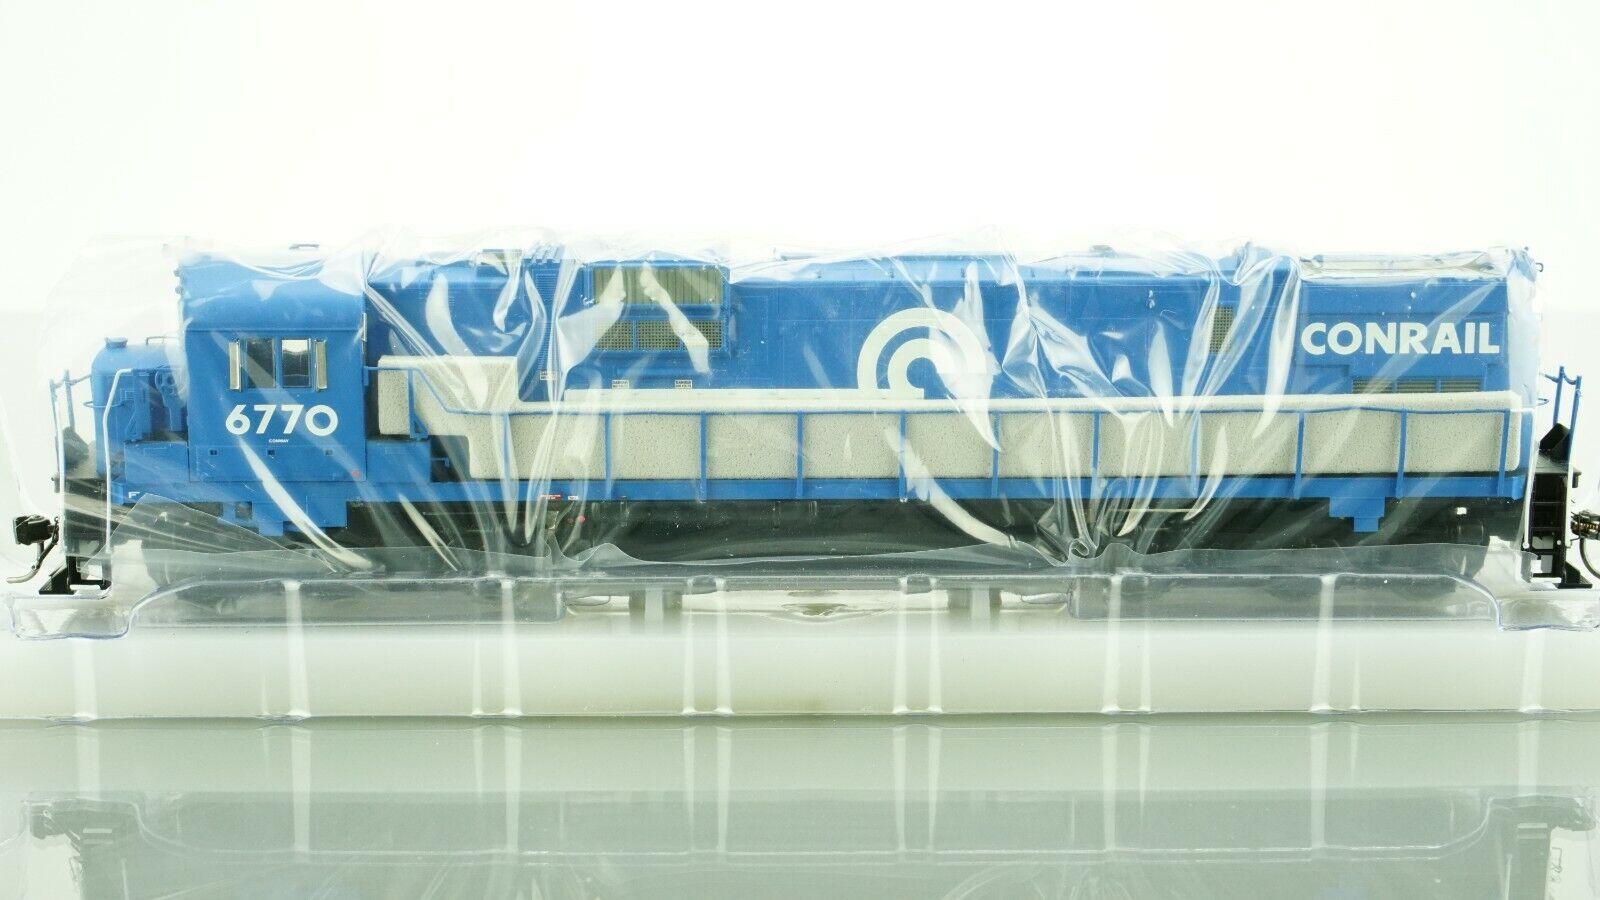 Bowser Alco C630 Conrail Dcc Listo Escala Ho